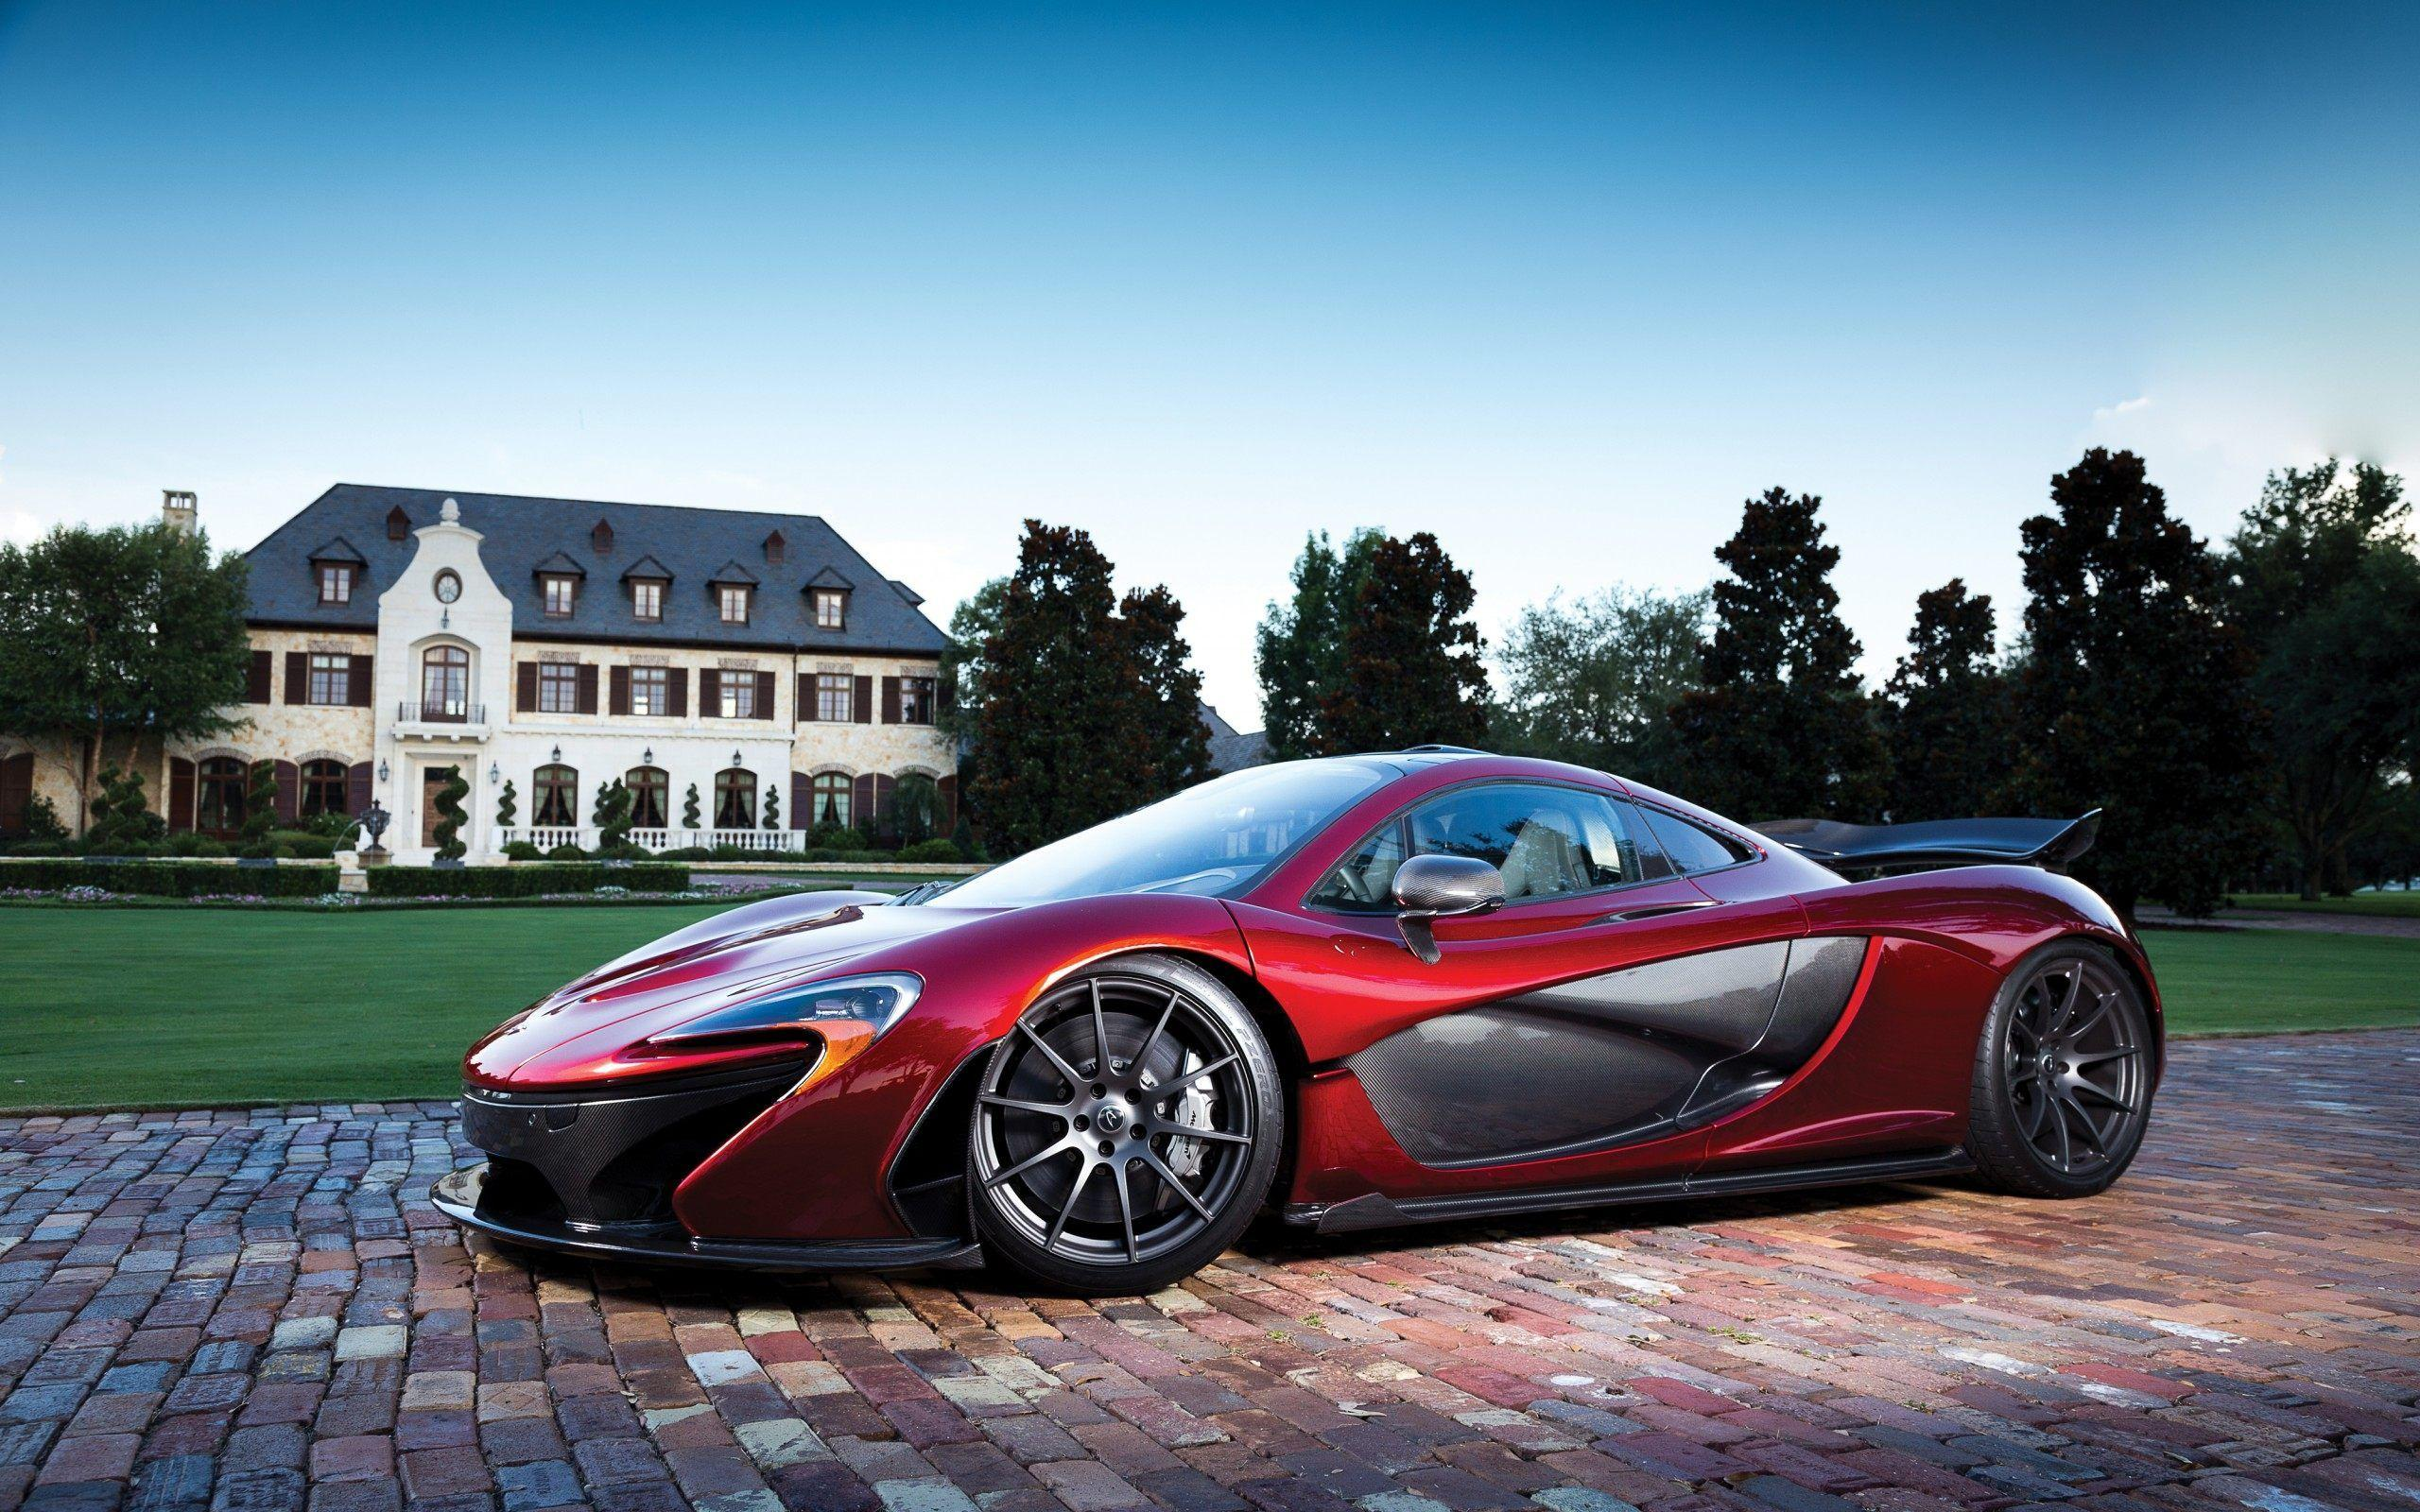 The Official McLaren Automotive Wallpapers